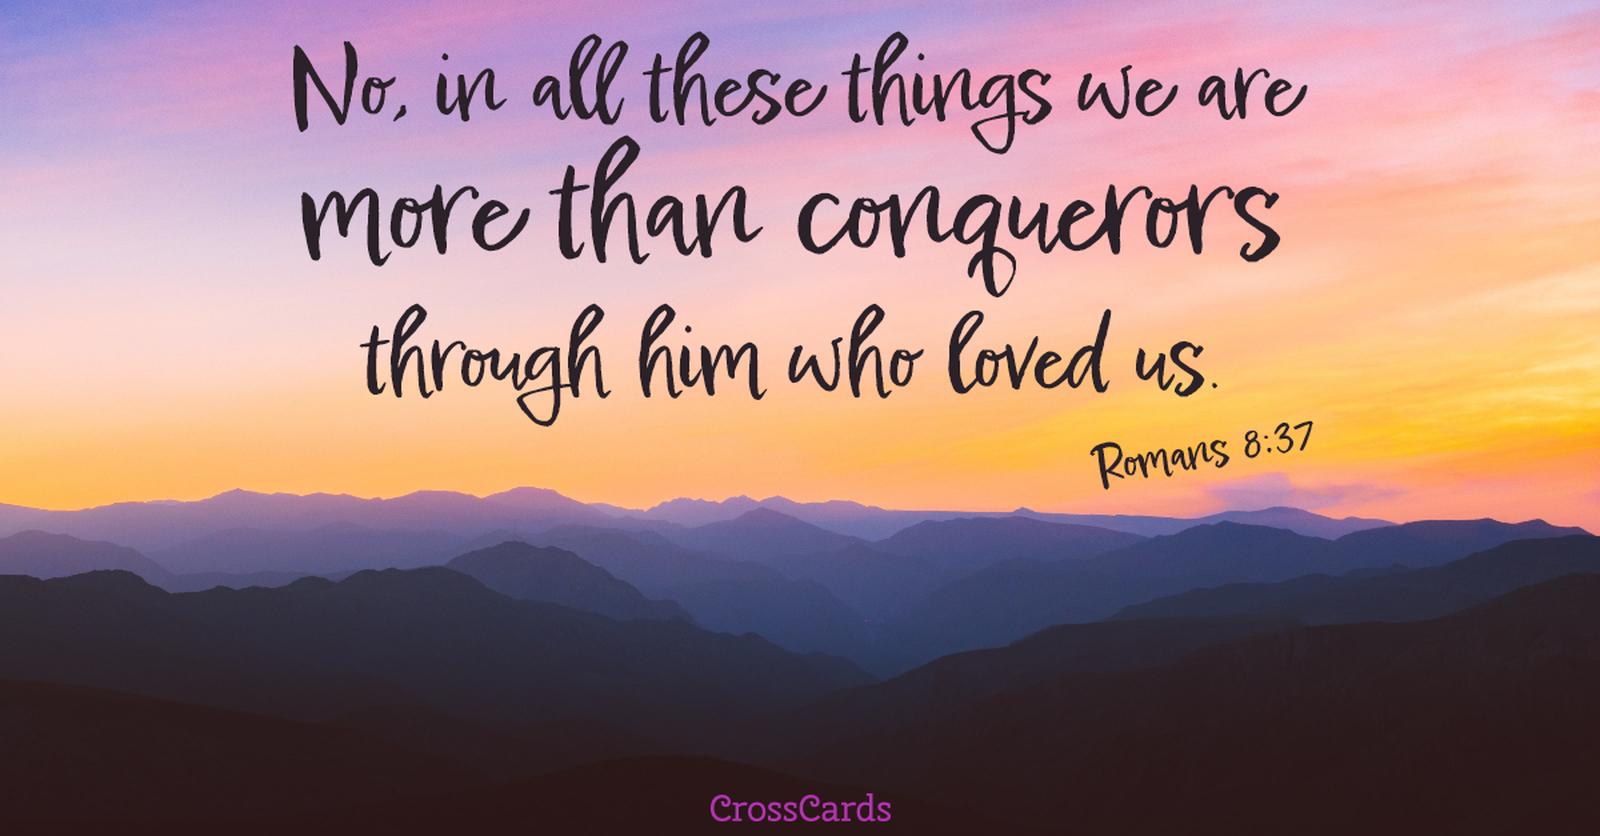 Romans 8:37 - More Than Conquerors ecard, online card